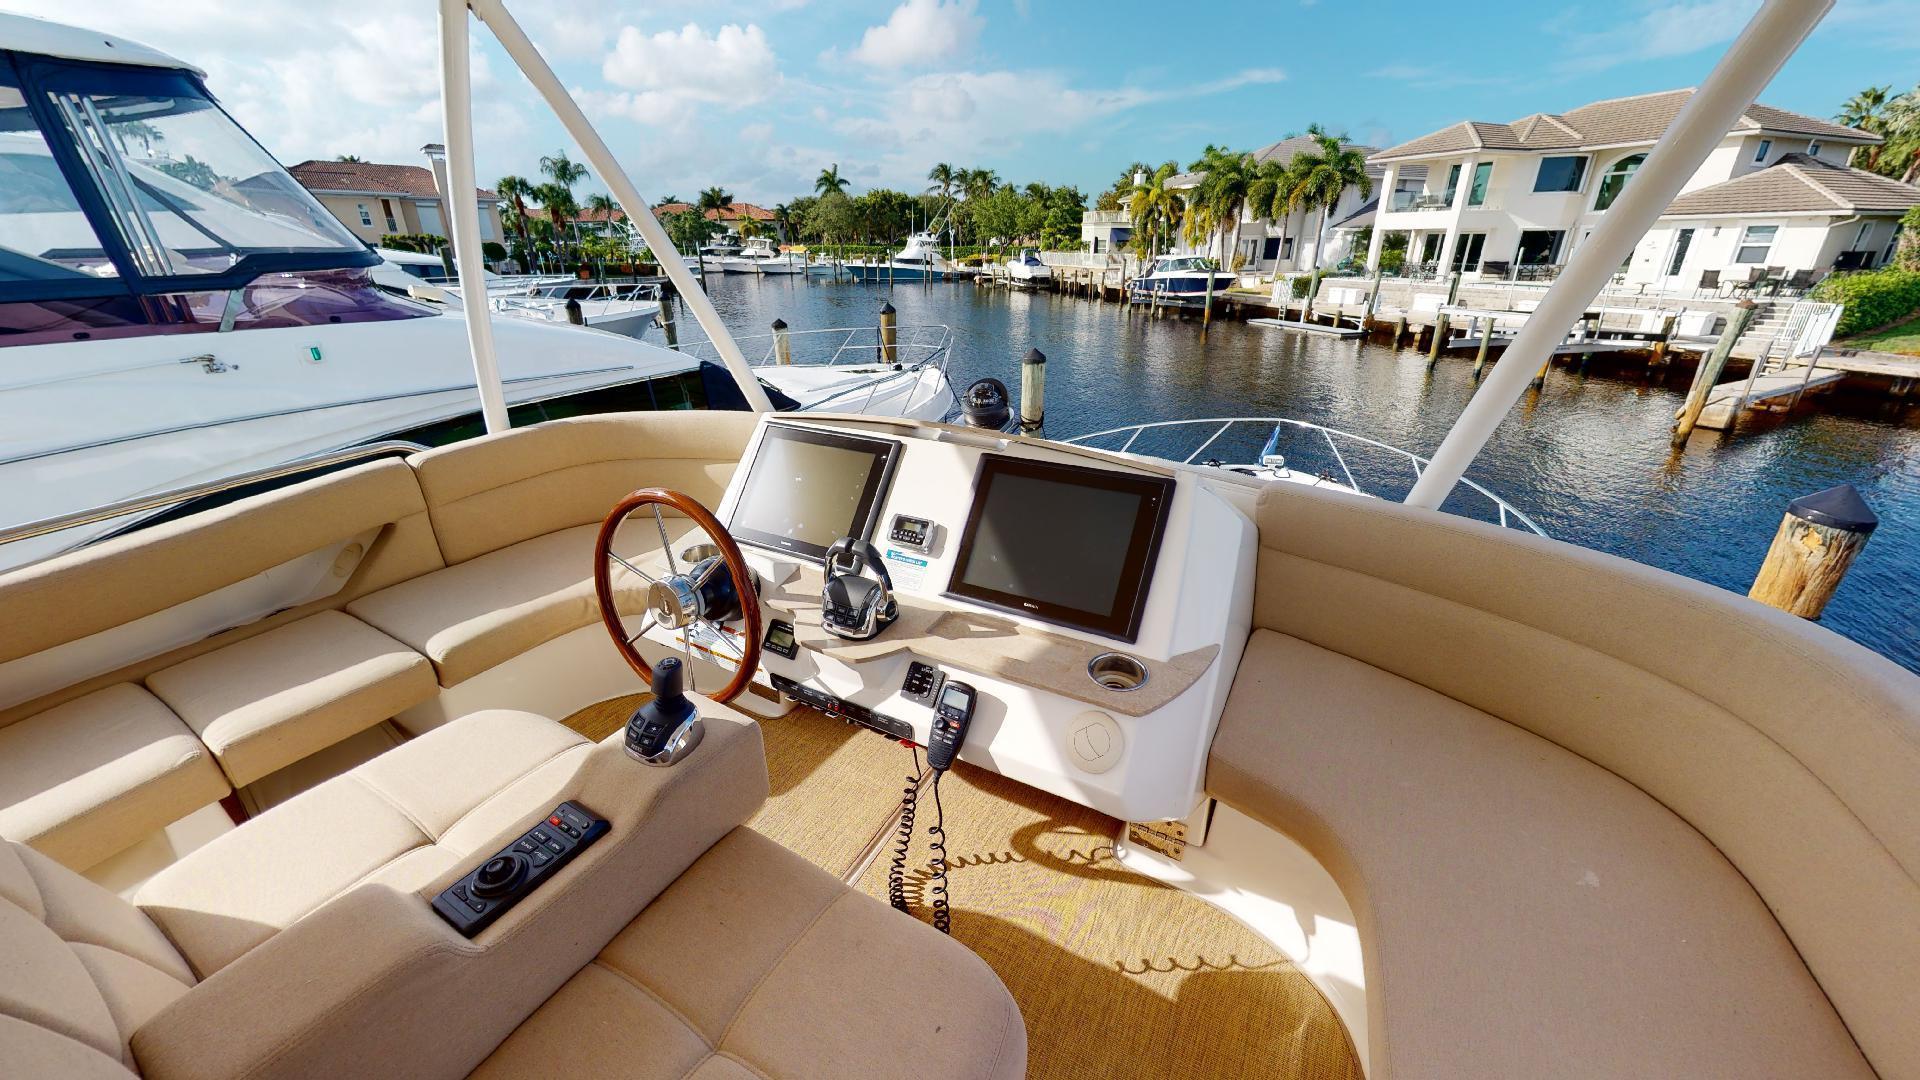 Tiara Yachts-50 Flybridge 2015-Khatch You Later North Palm Beach-Florida-United States-Flybridge-1509437 | Thumbnail